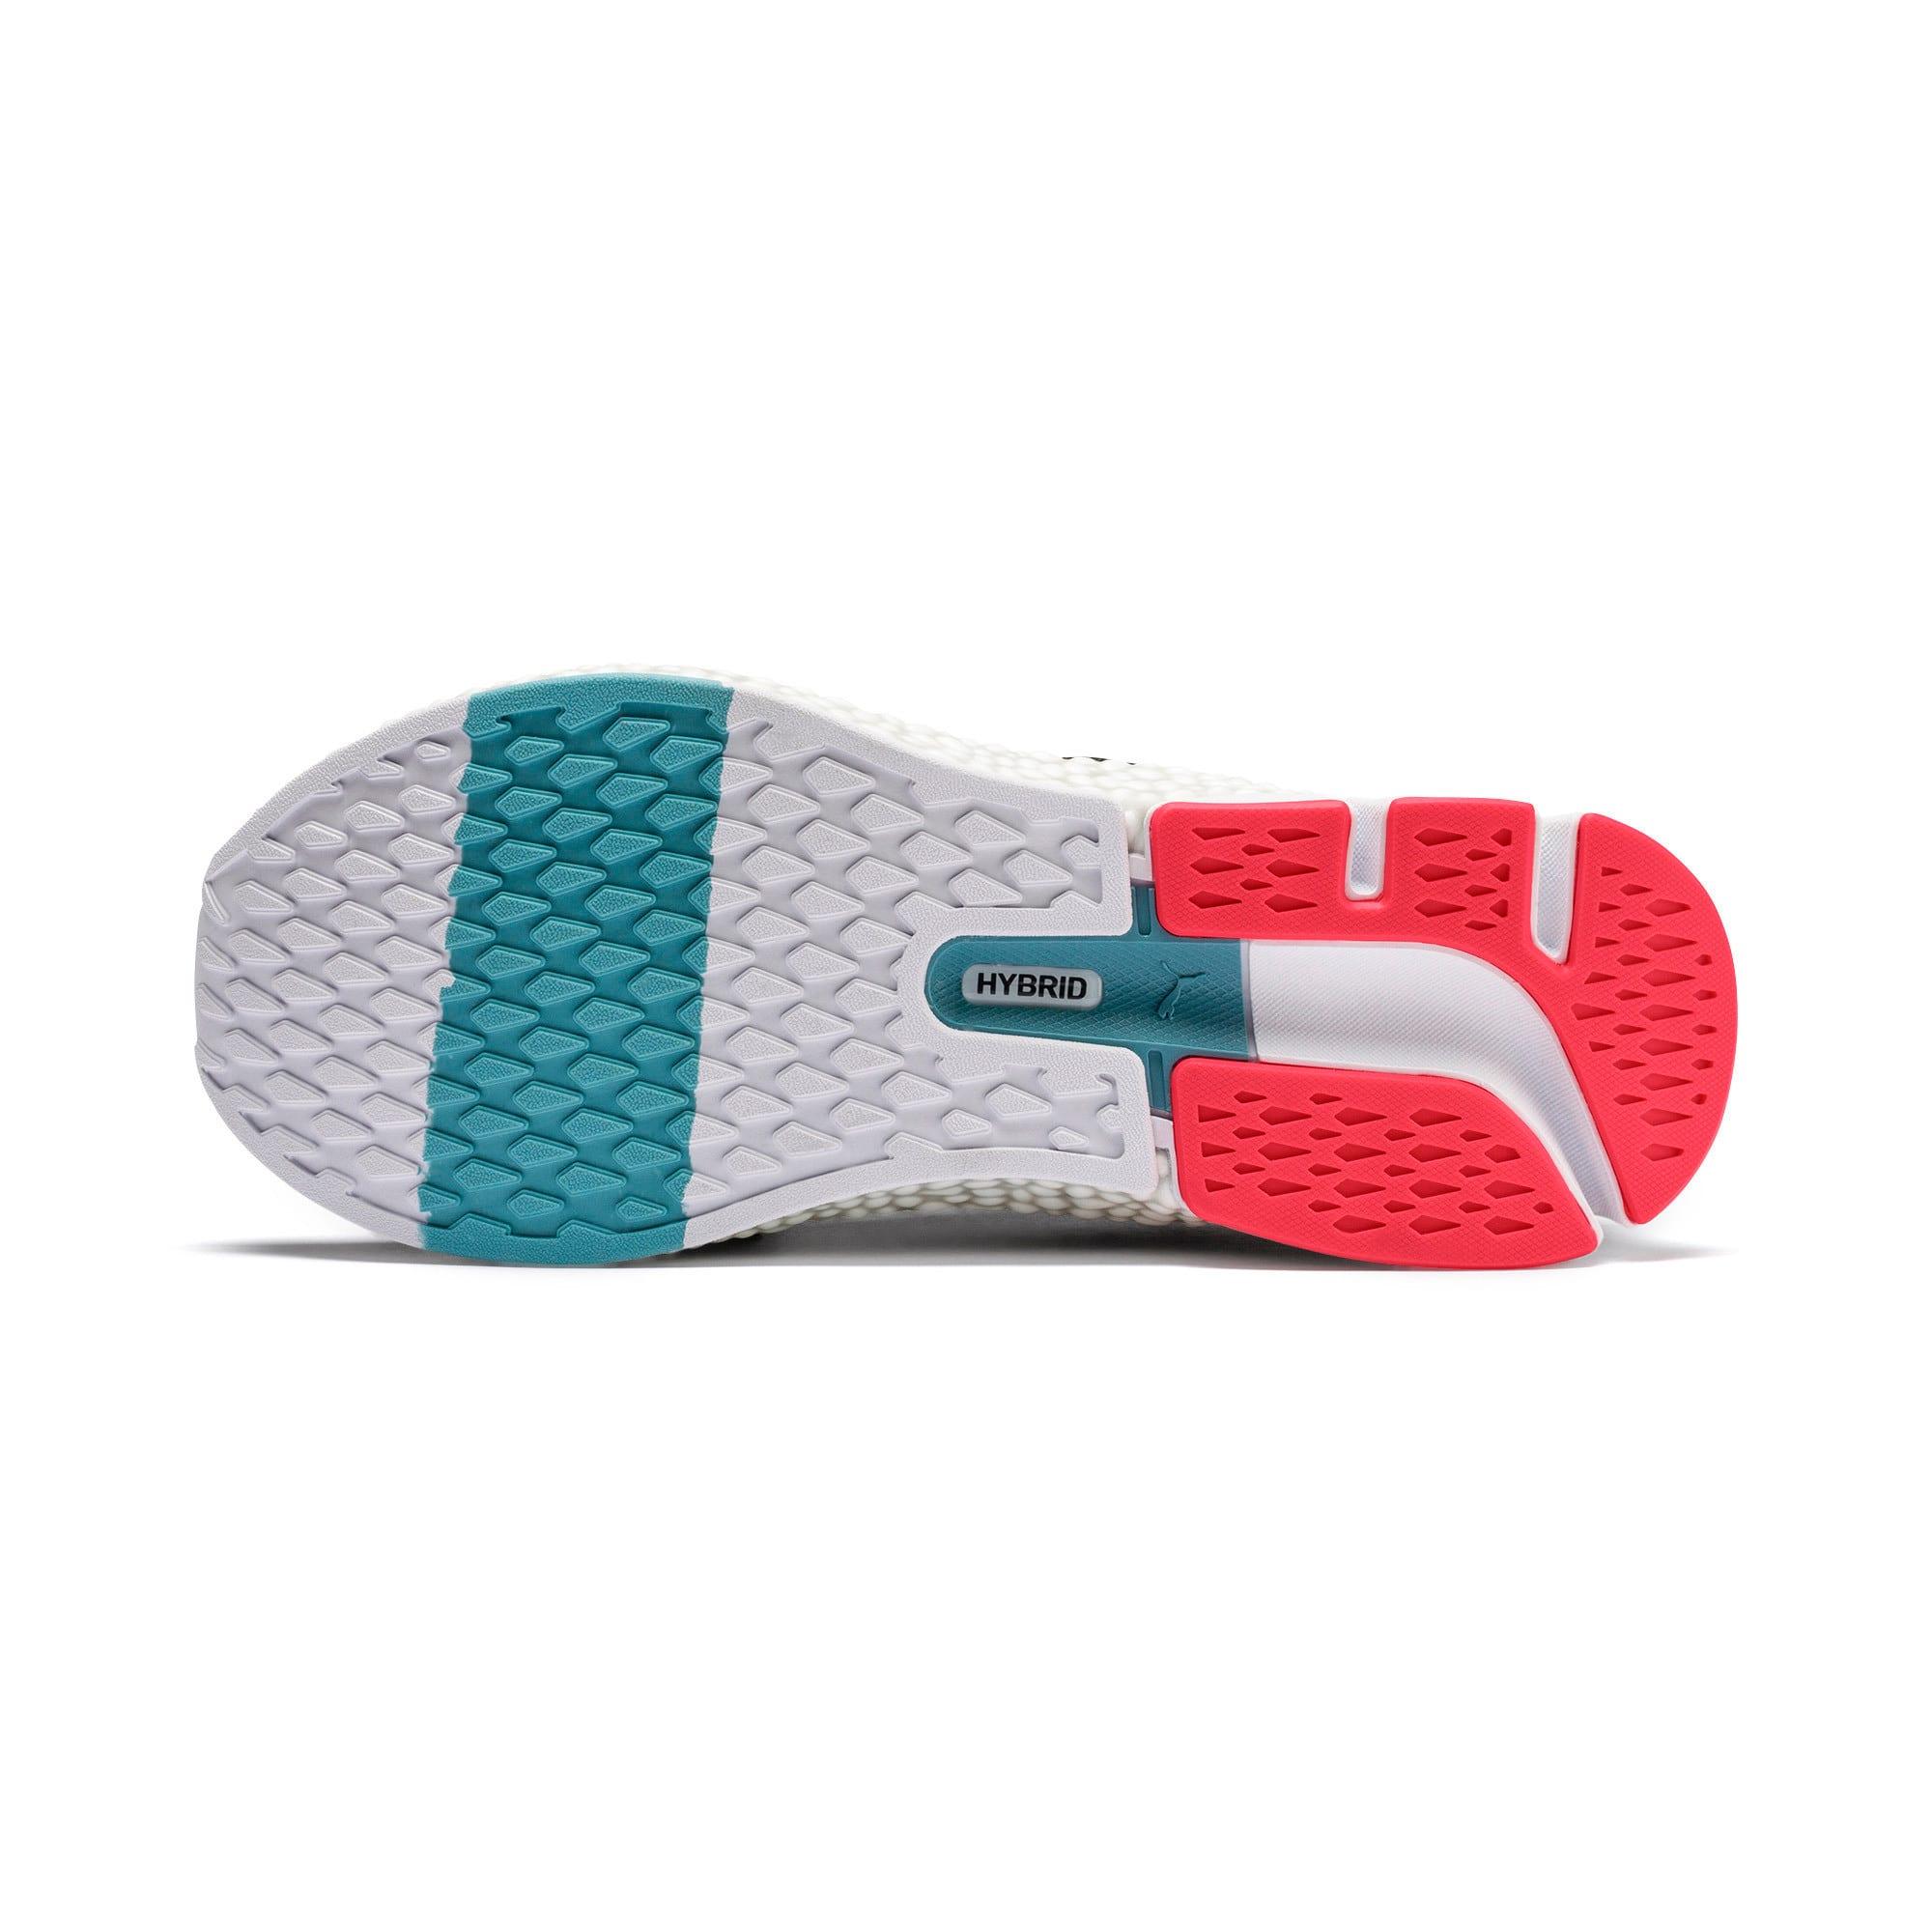 Thumbnail 5 of HYBRID Astro Women's Running Shoes, Puma Black-Pink Alert, medium